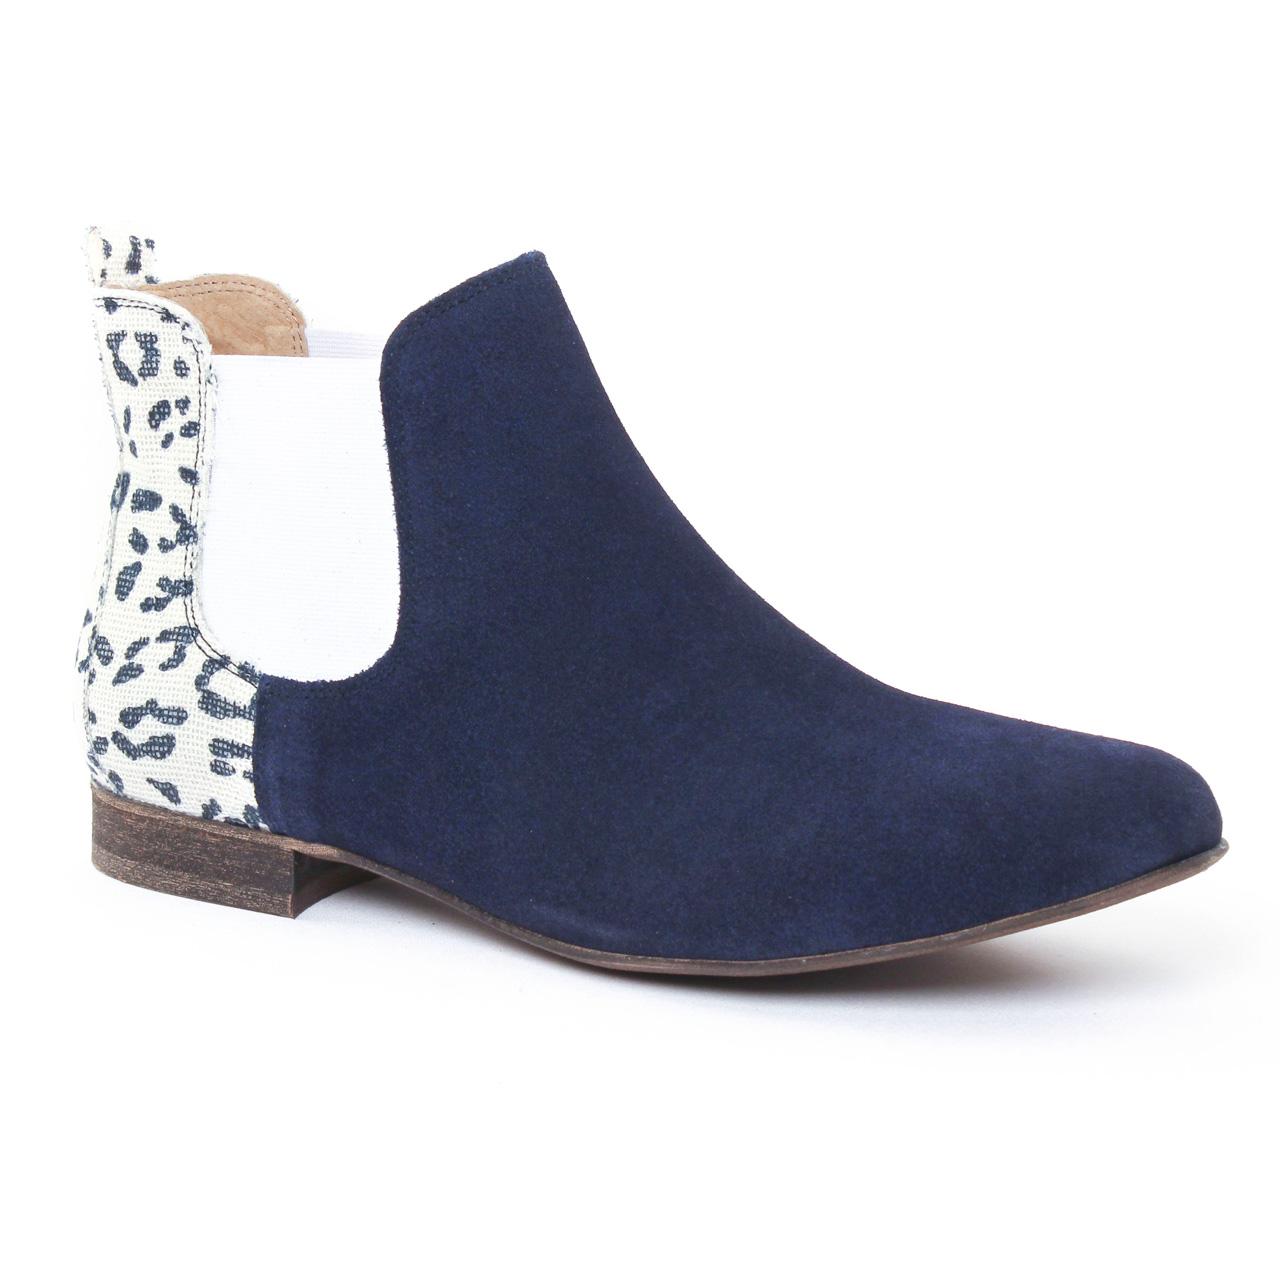 axell tual marine boot lastiqu es bleu marine printemps t chez trois par 3. Black Bedroom Furniture Sets. Home Design Ideas